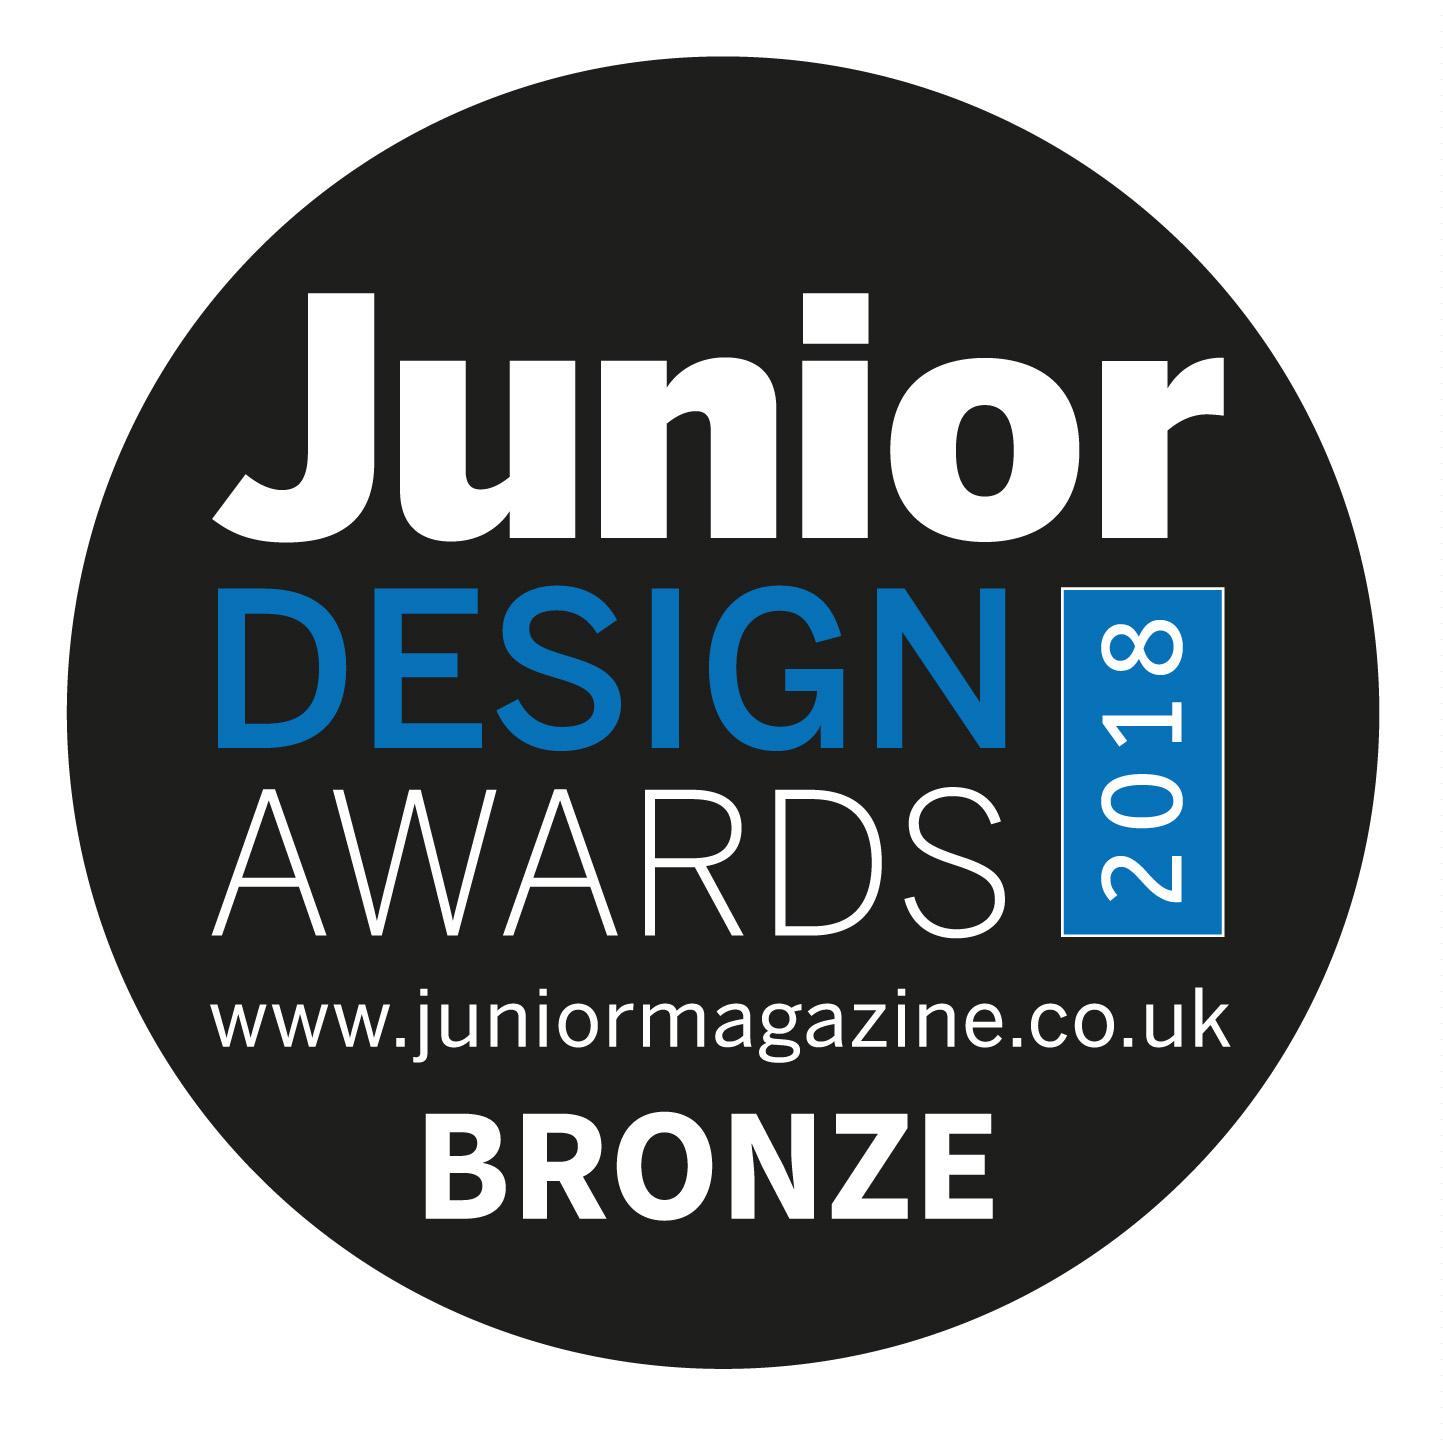 JDA18_Logos_Bronze1 copy.jpg